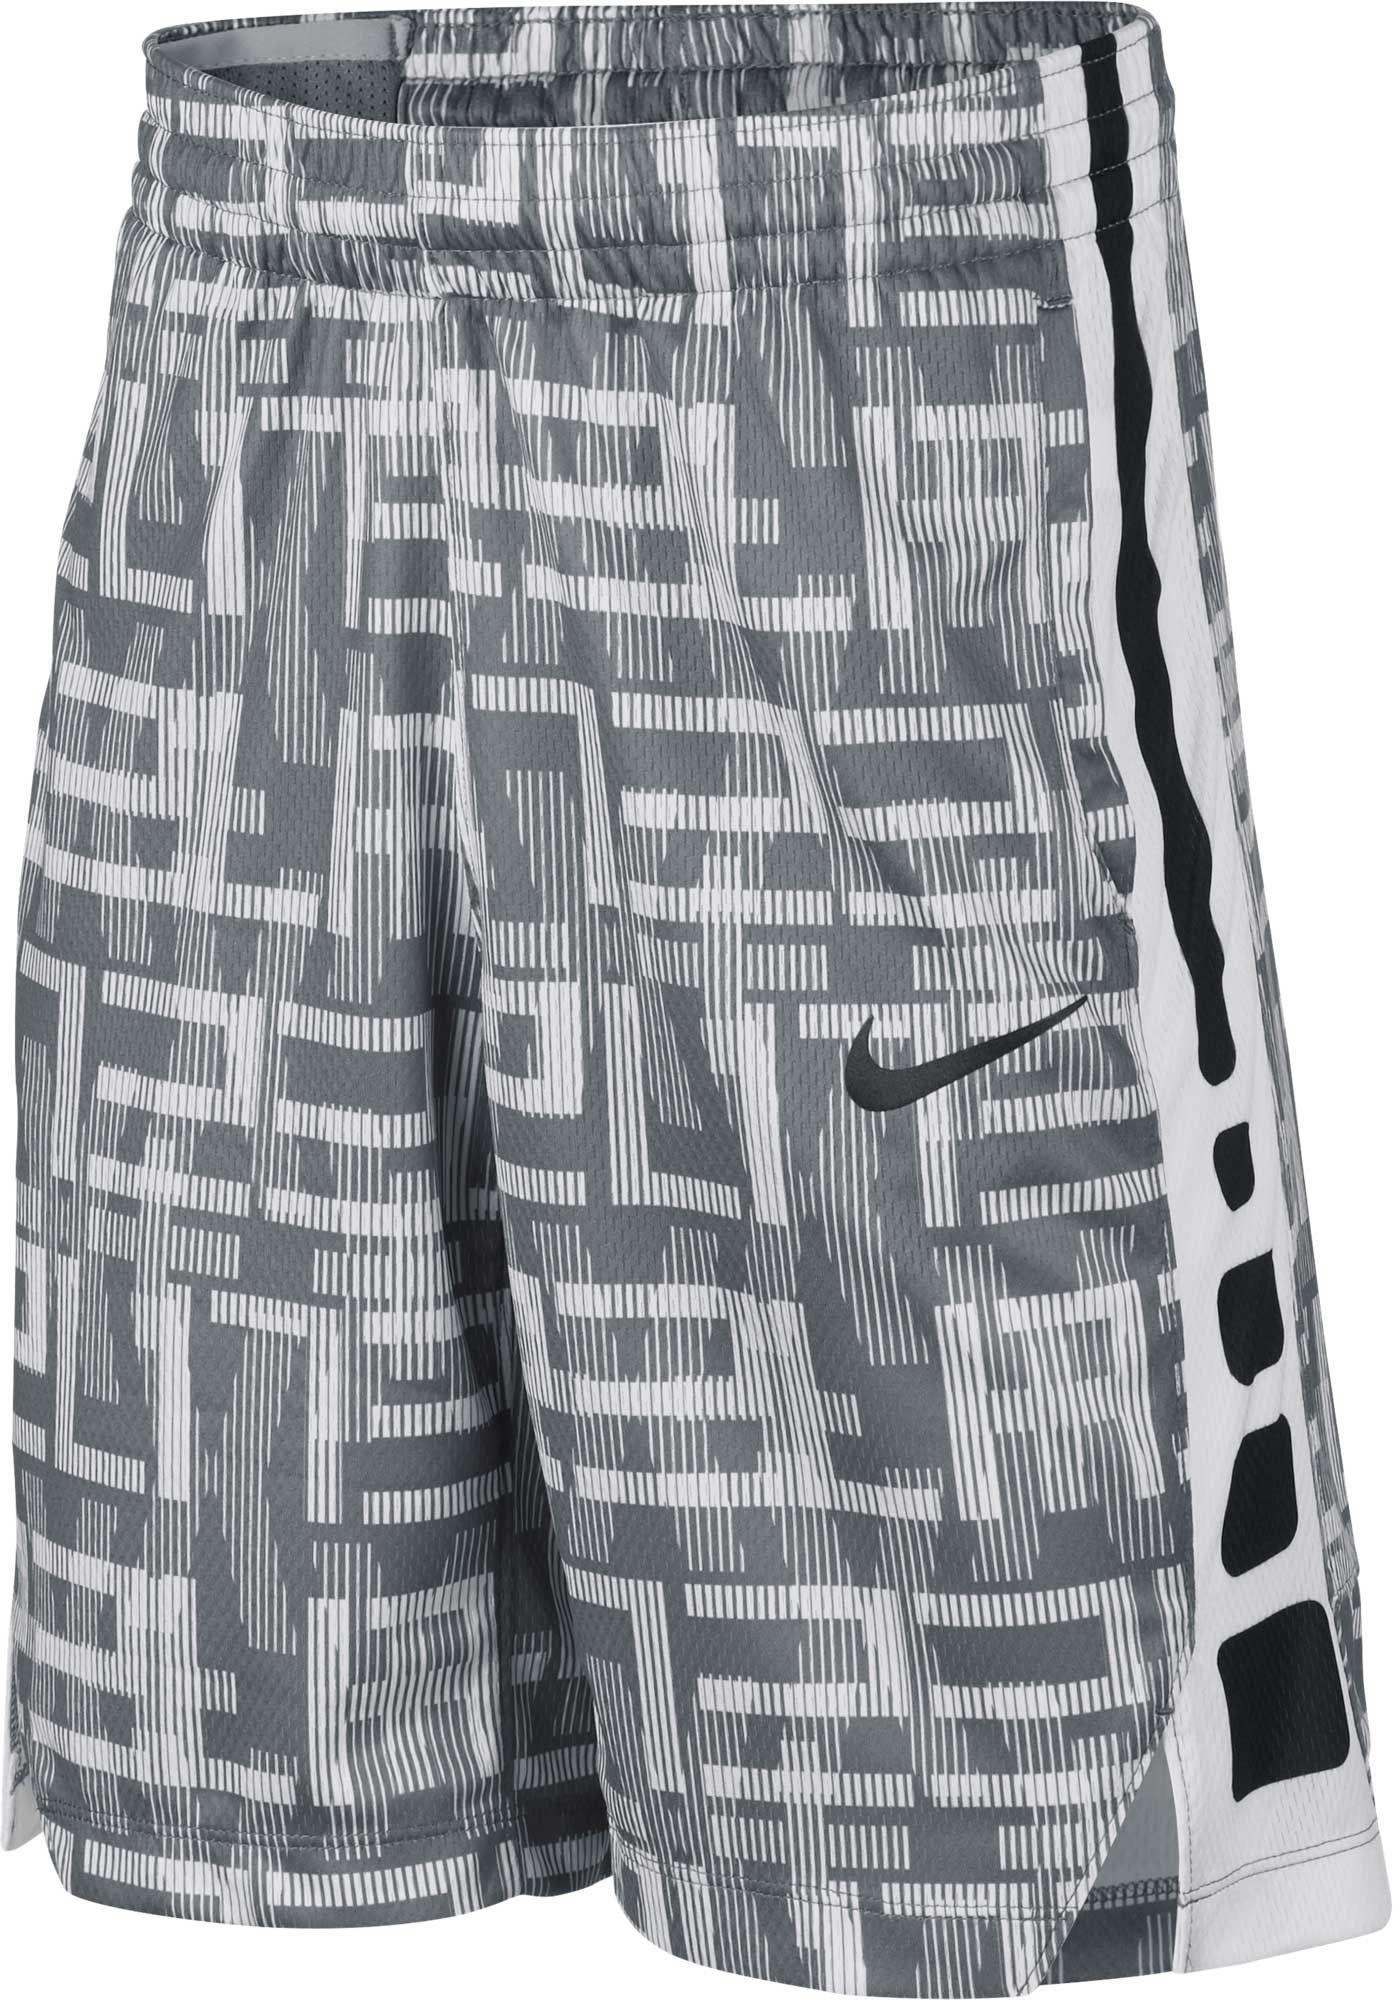 Nike KD Elite Basketball Mens Shorts L White Black Paisley Casual Gym New